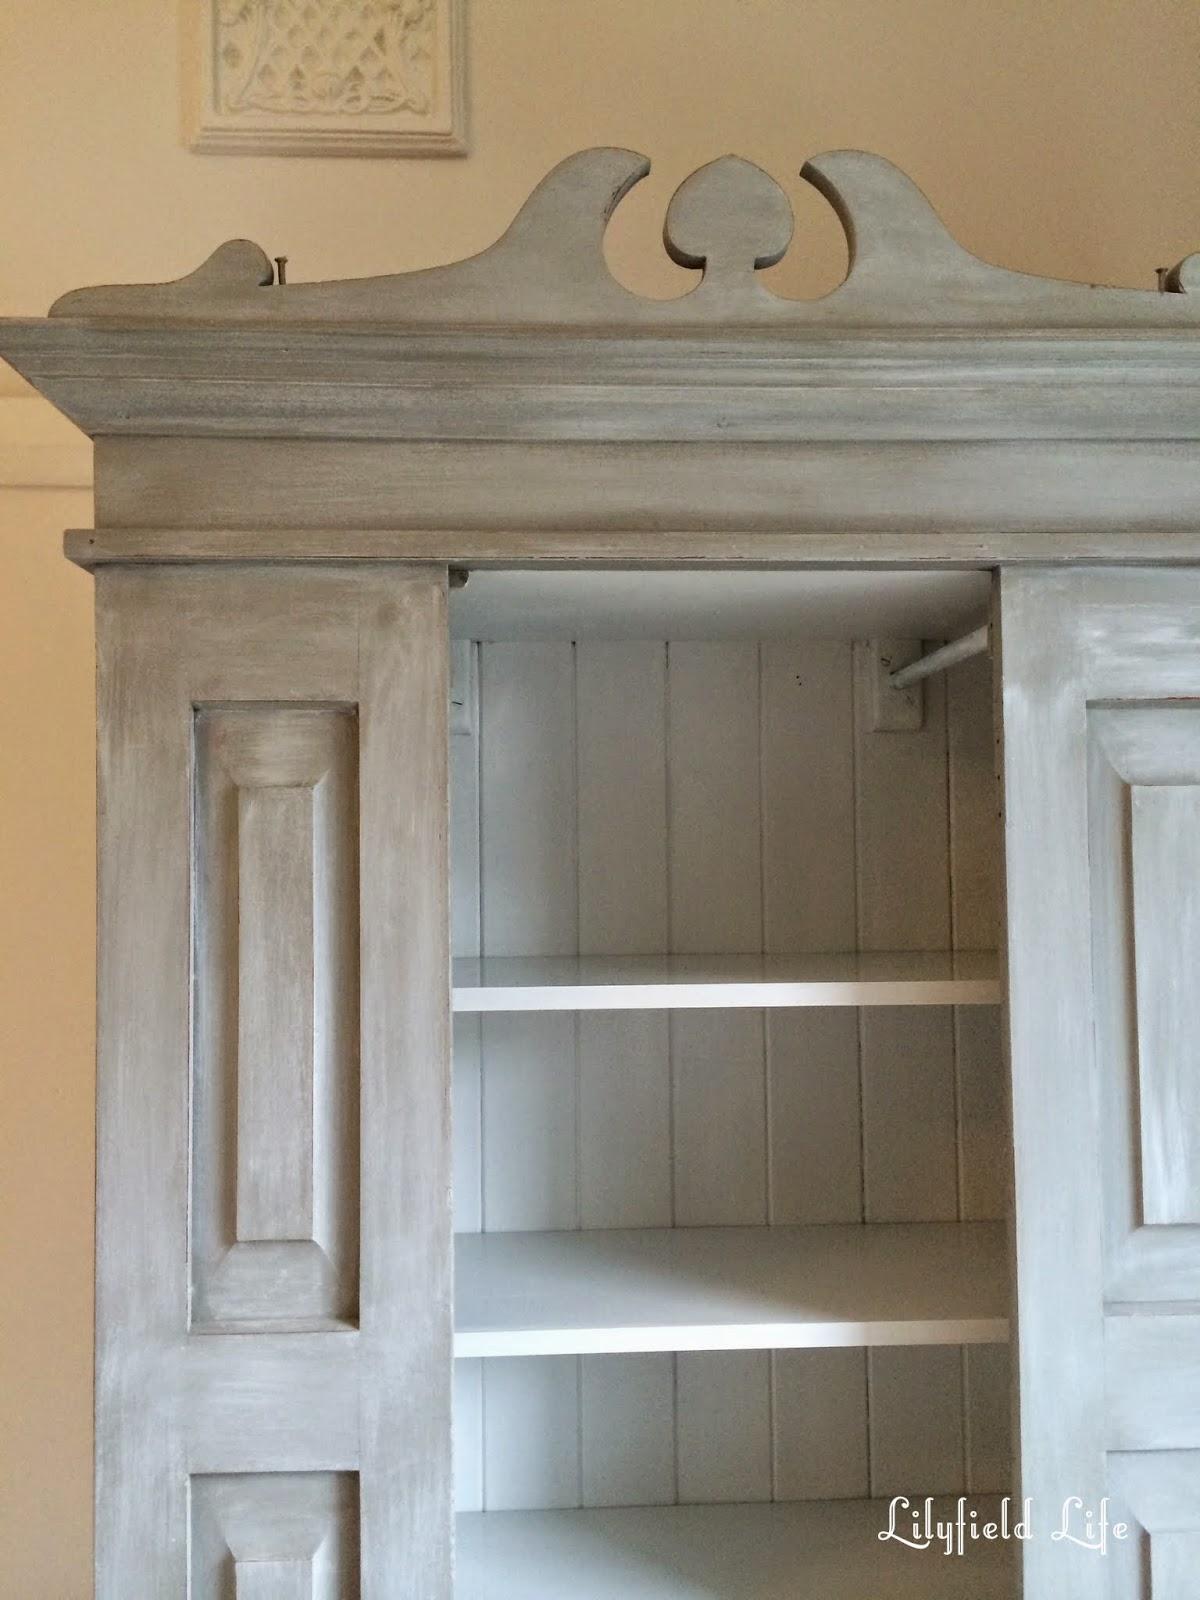 Restoration Hardware Knock Off: Lilyfield Life: Restoration Hardware Look Cupboard